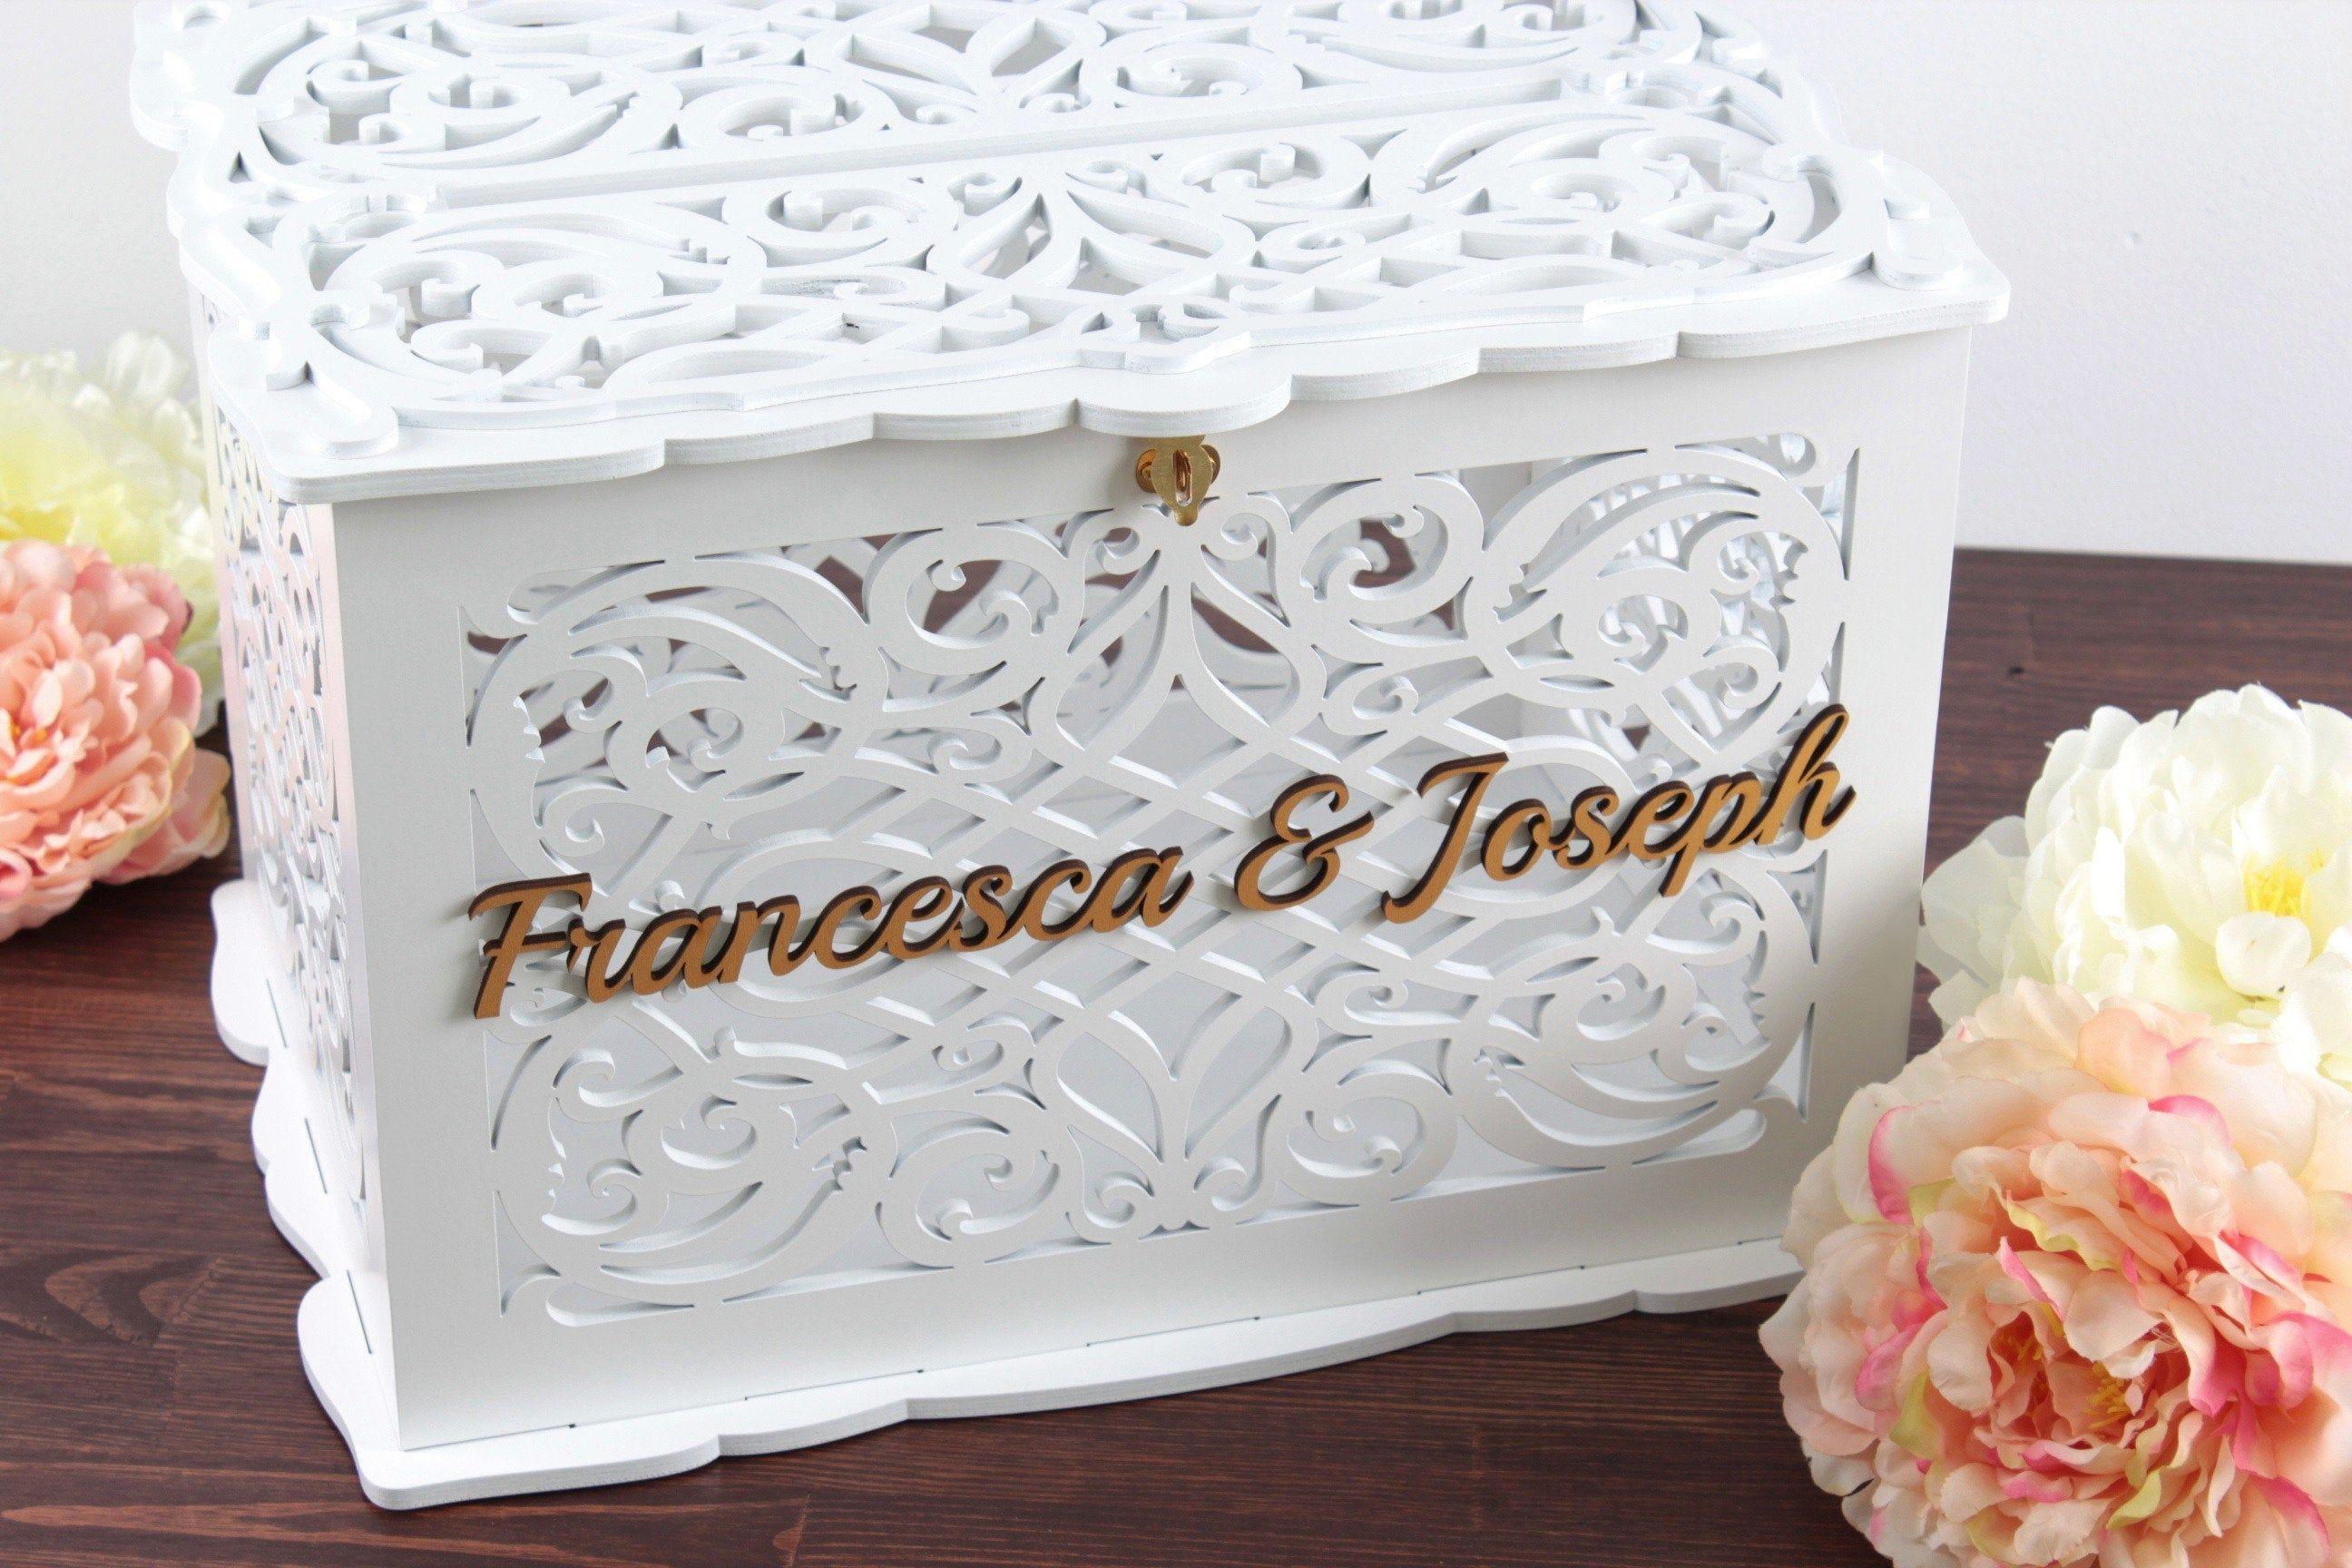 Wedding Envelope Box Wedding Card Box Wedding Gift Wedding Etsy In 2020 Card Box Wedding Wedding Envelope Box Wedding Card Holder